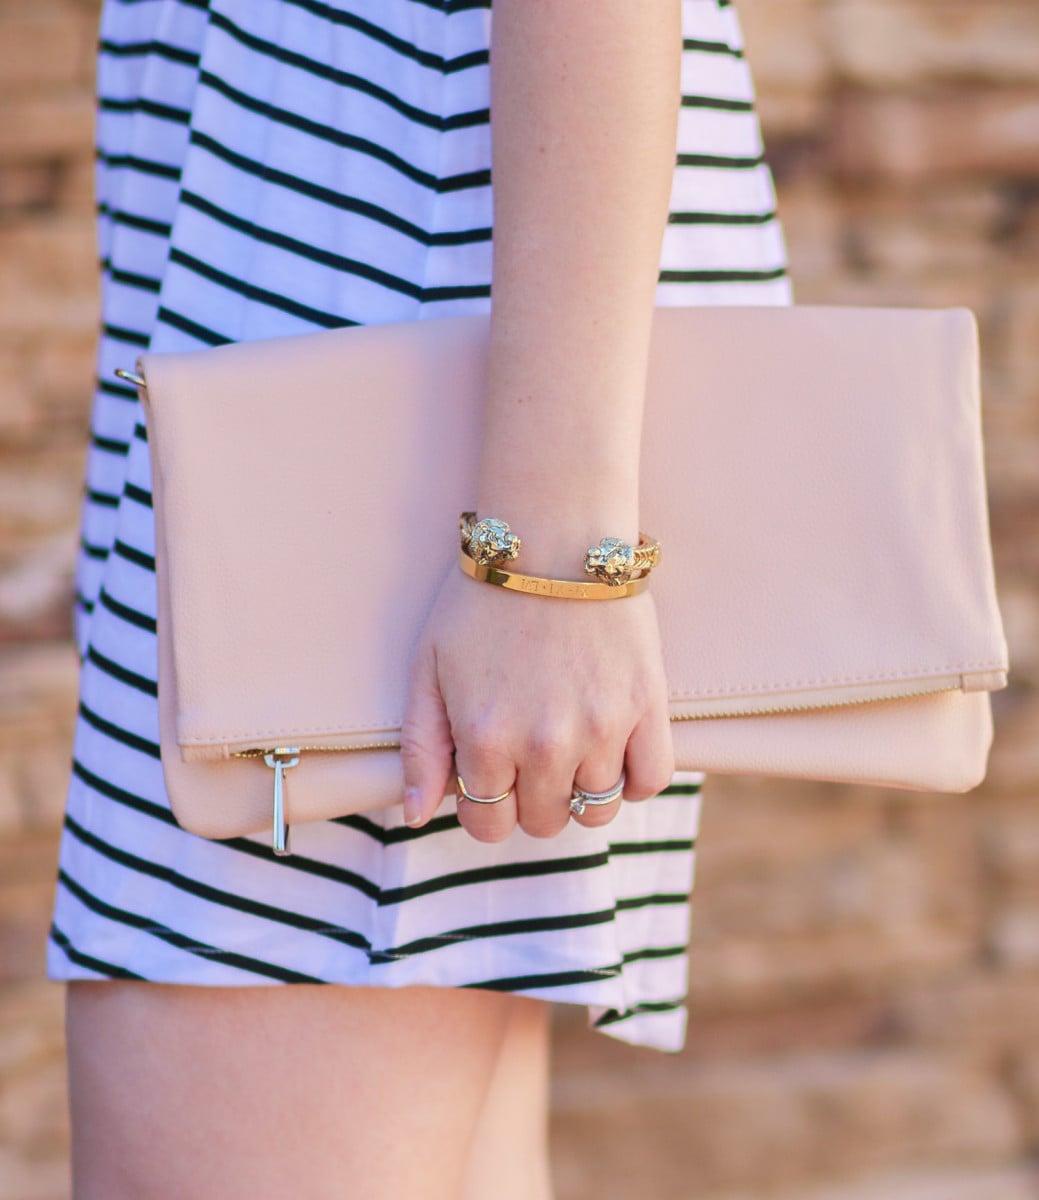 Express rose quartz clutch + Baublebar Leo Cuff + Taudrey The Fashionista's Diary Set customized gold bracelet